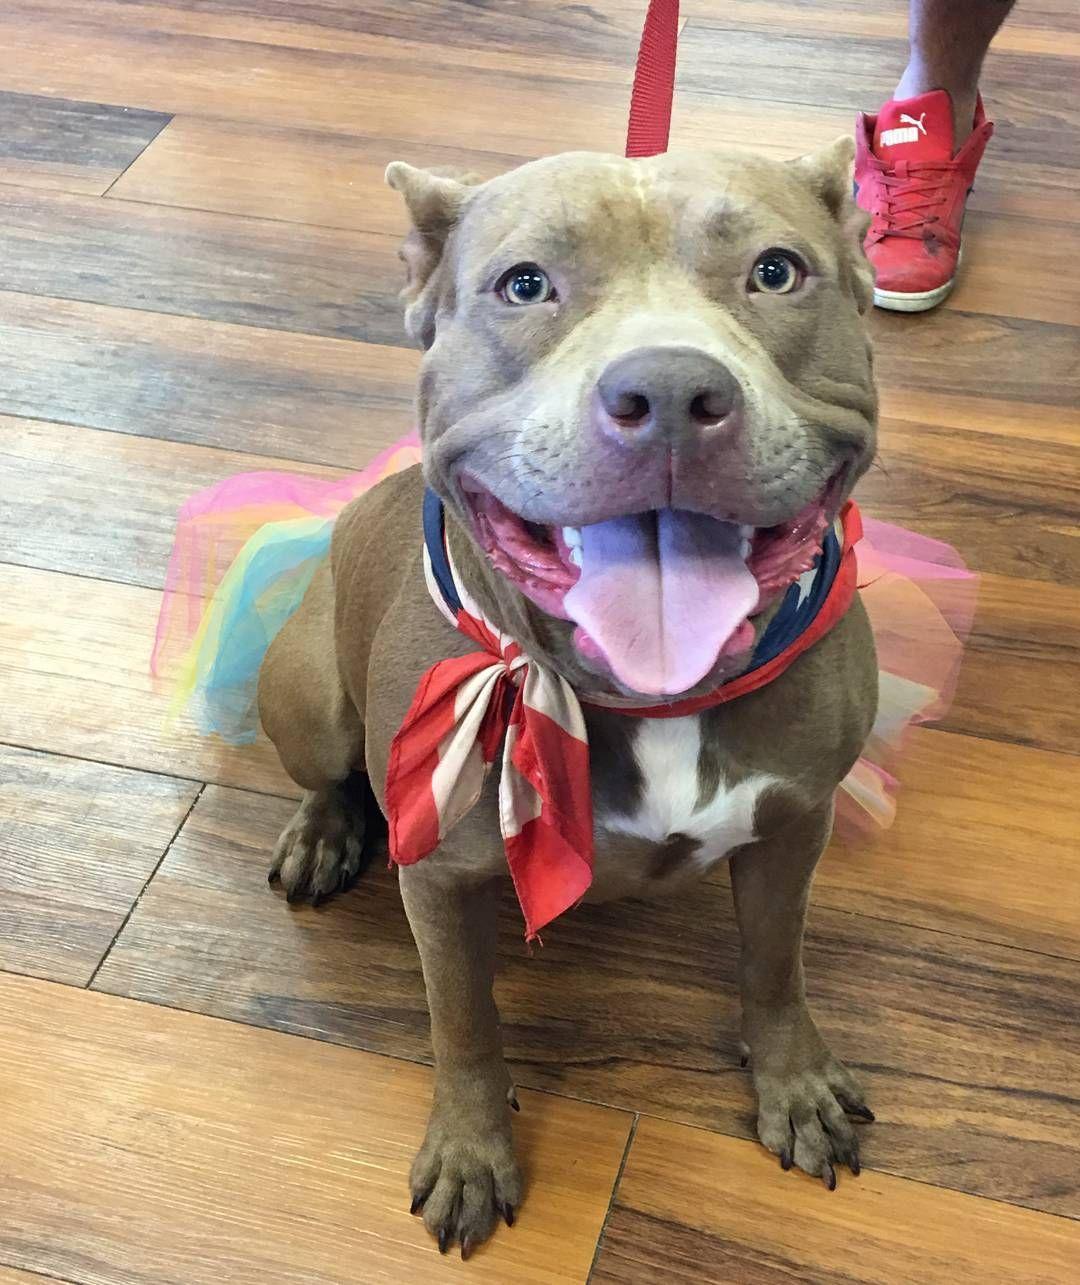 Cutecustomeralert Meika Cutecustomeralert From Pet Valu Glassboro Nj Stopped By To Pick Out A Tutu Pet Valu Pets Instagram Posts Cute